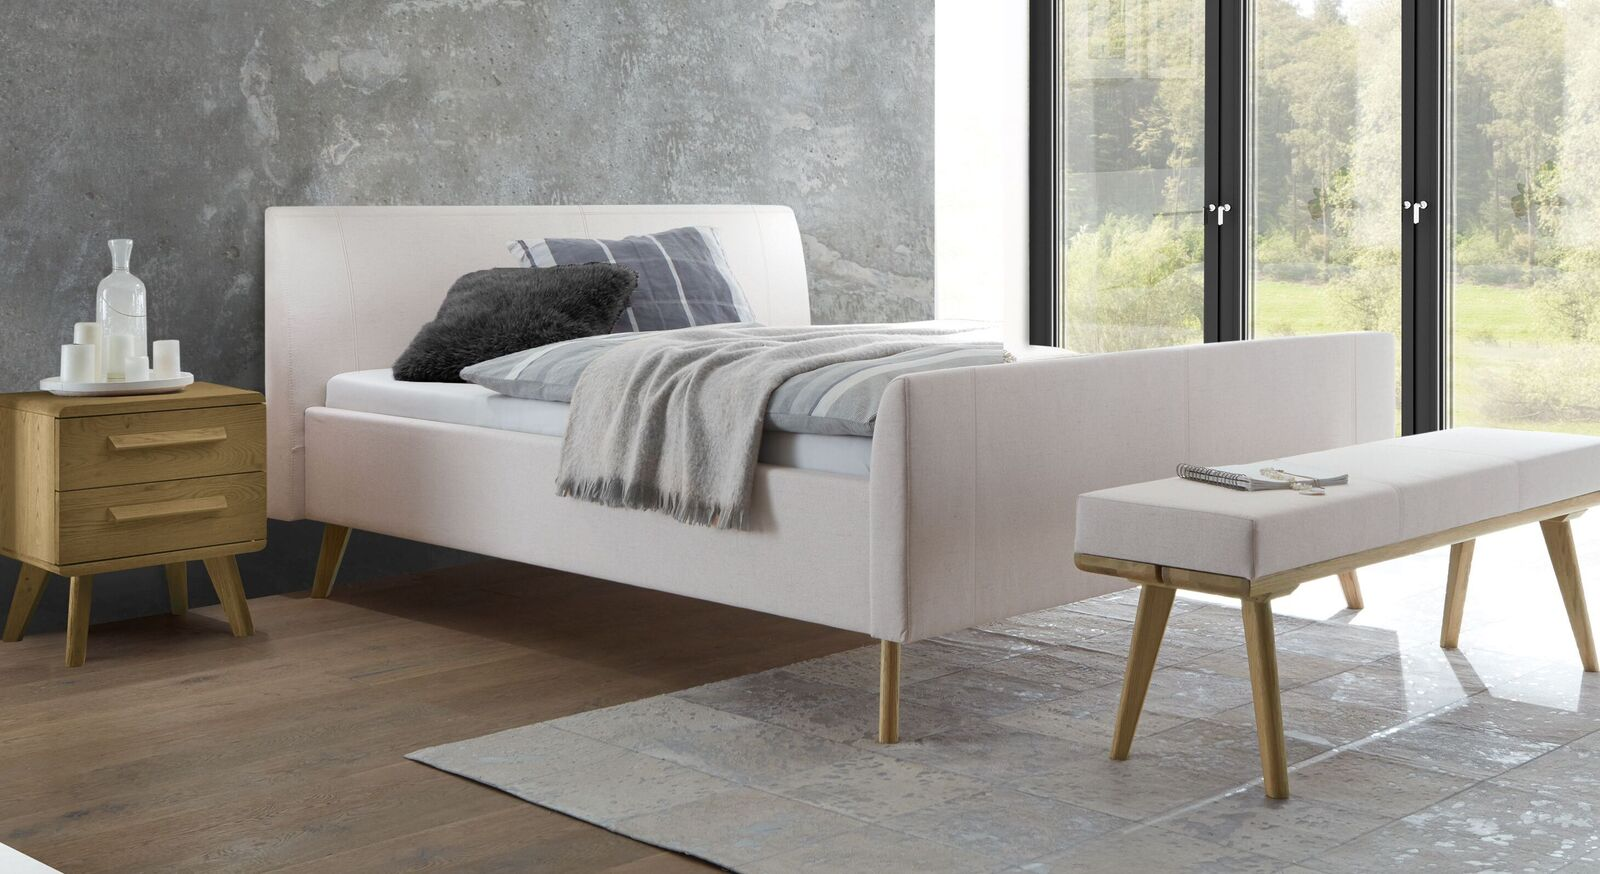 Gepolstertes Bett Nelka mit kalkfarbenem Stoffbezug